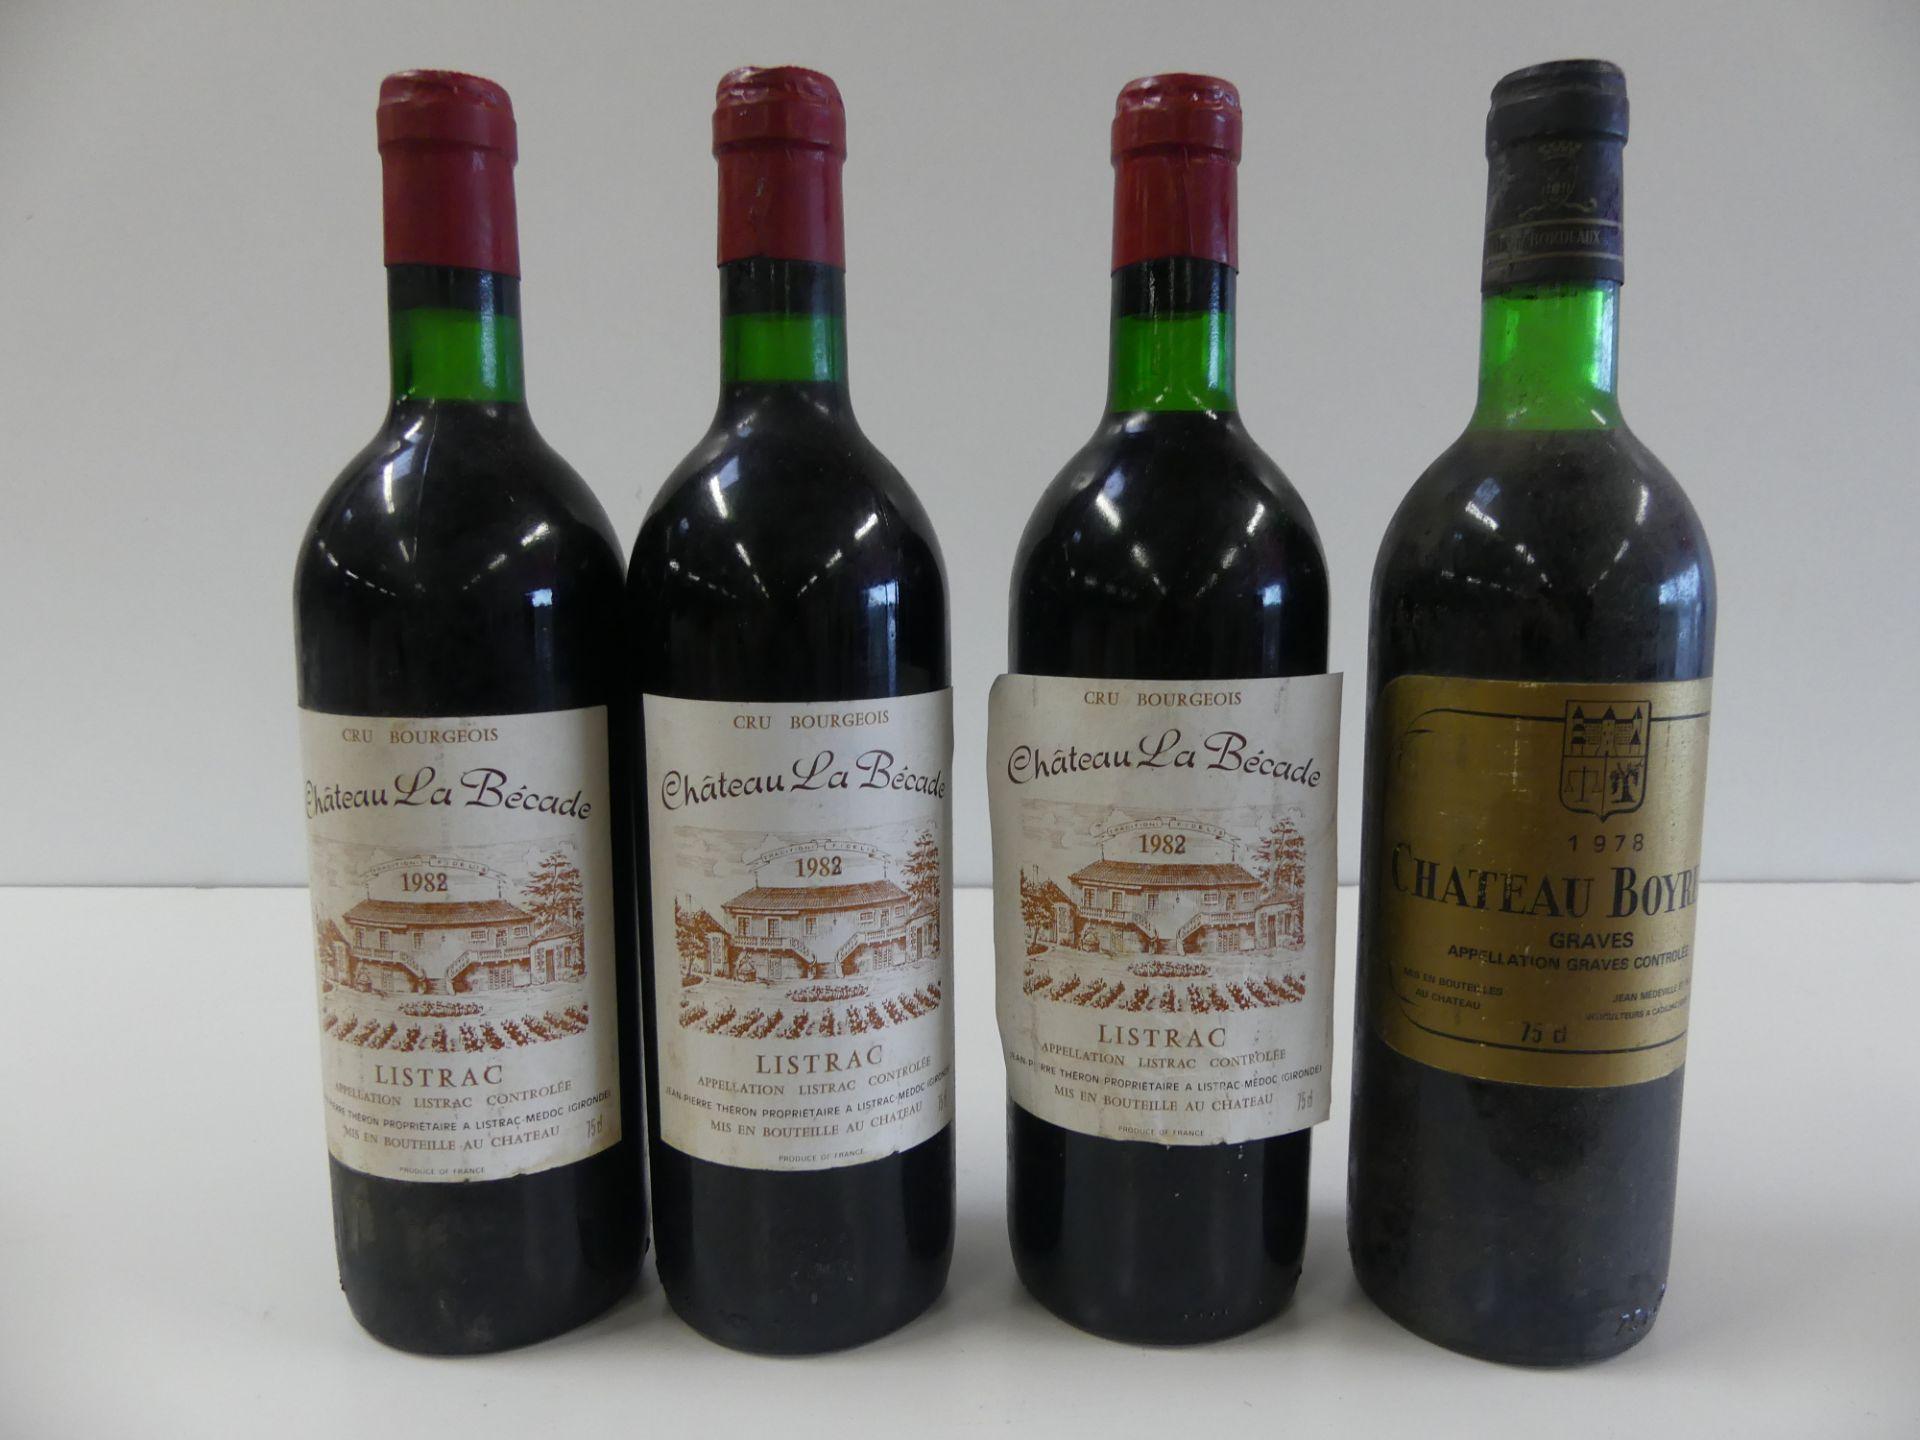 Los 52 - 4 BTLES : 3 Château La Bécade Listrac Cru Bourgeois (1982 ou 1988 ?) ; 1 Château [...]